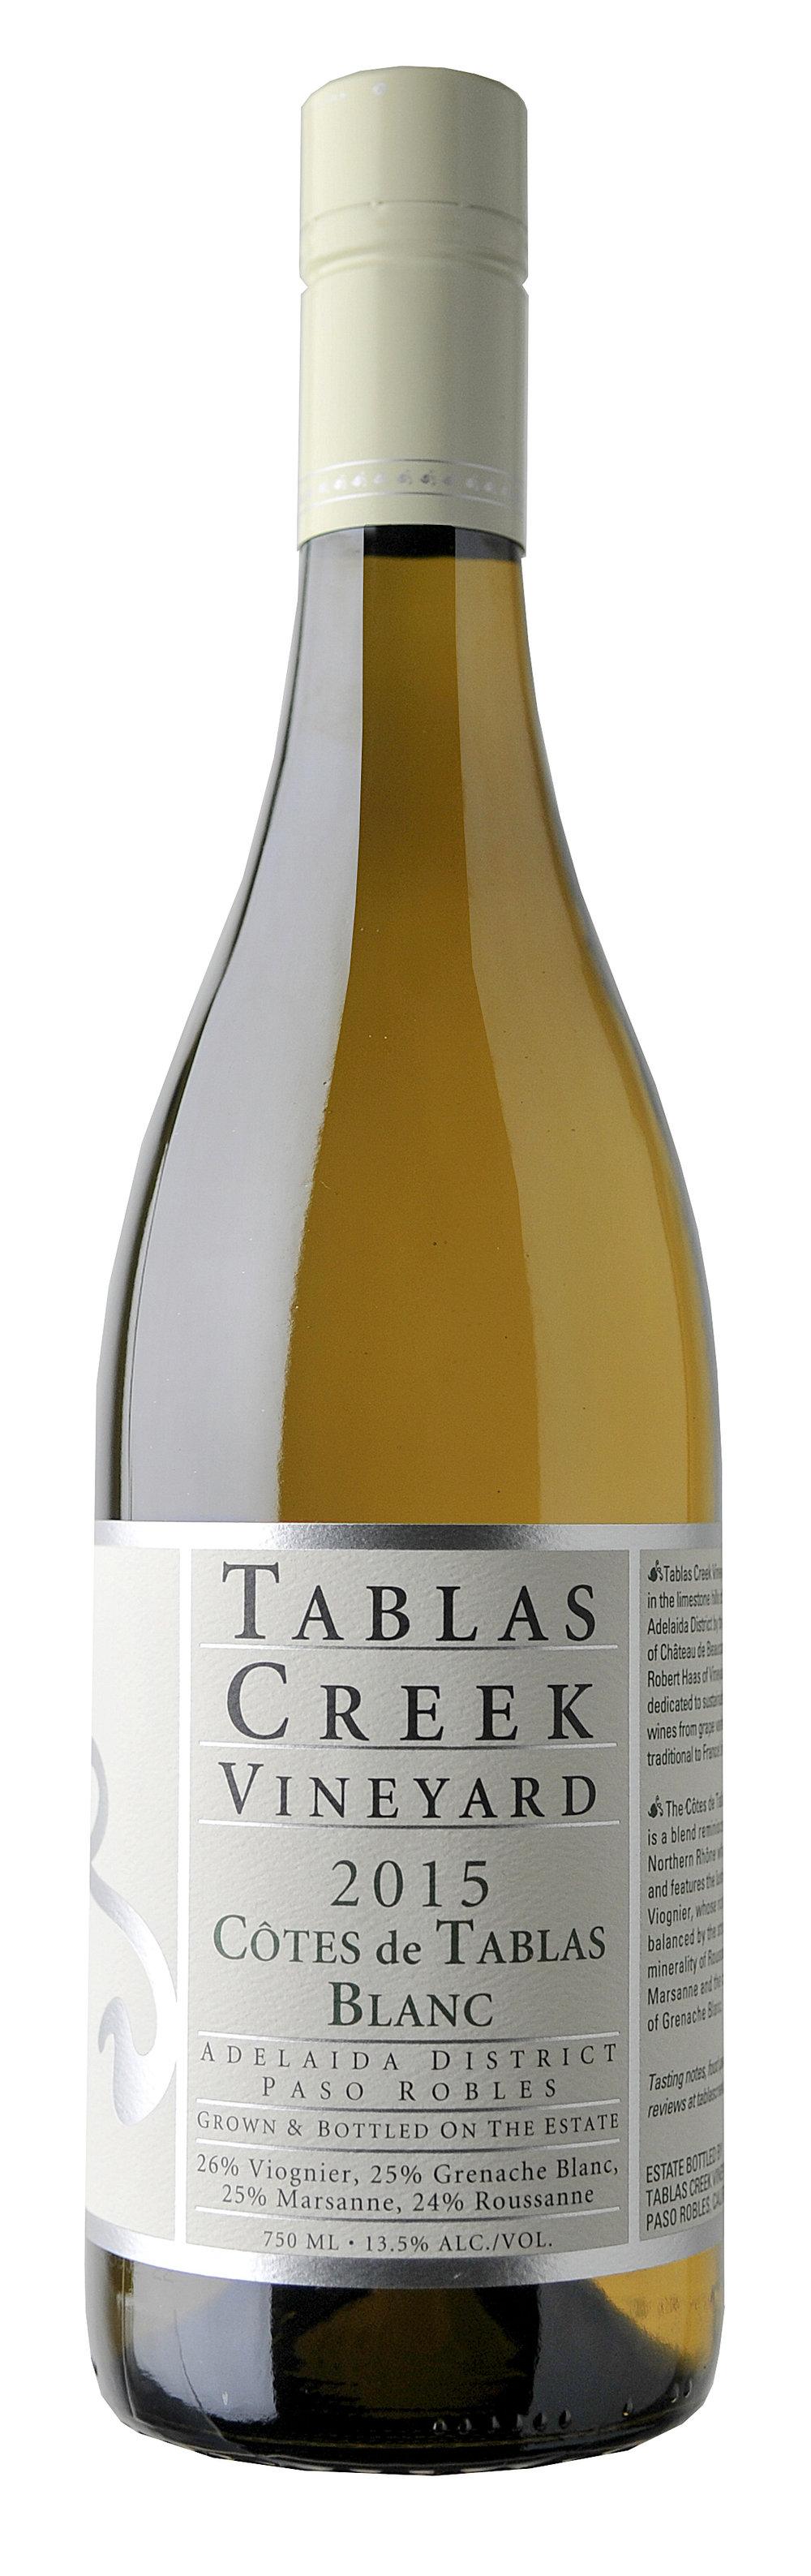 Tablas Creek Côtes de Tablas Blanc 2015 Bottle.jpg